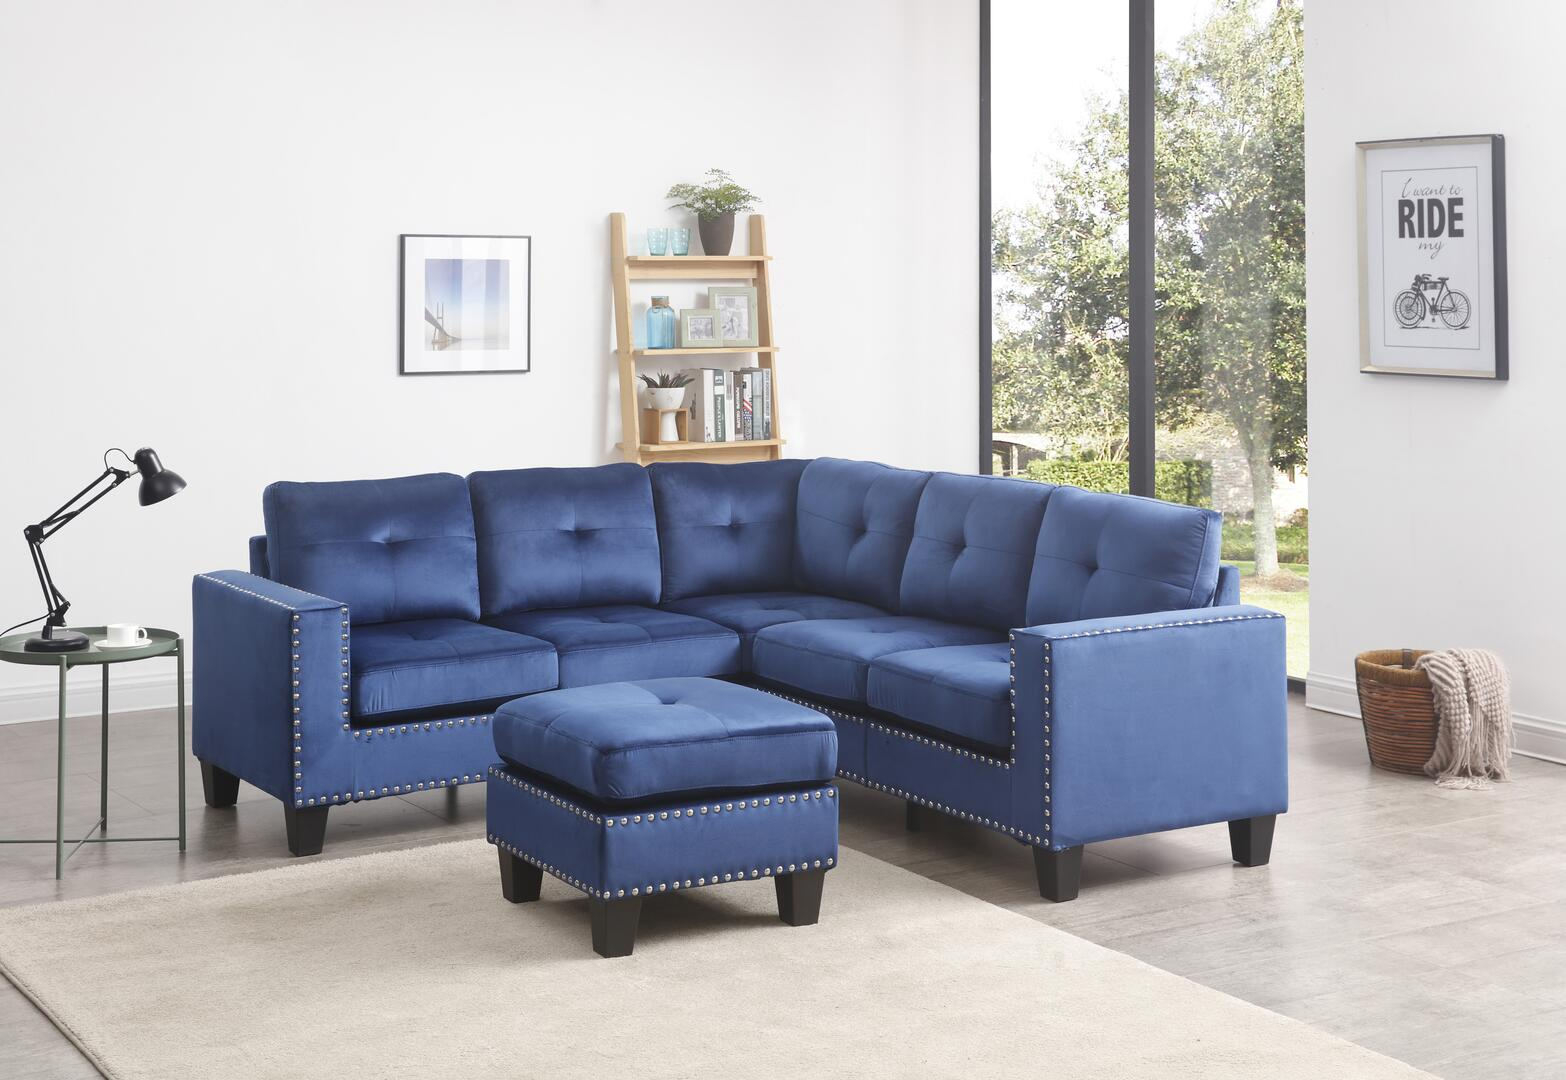 Pleasant Glory Furniture G313Bsco Machost Co Dining Chair Design Ideas Machostcouk